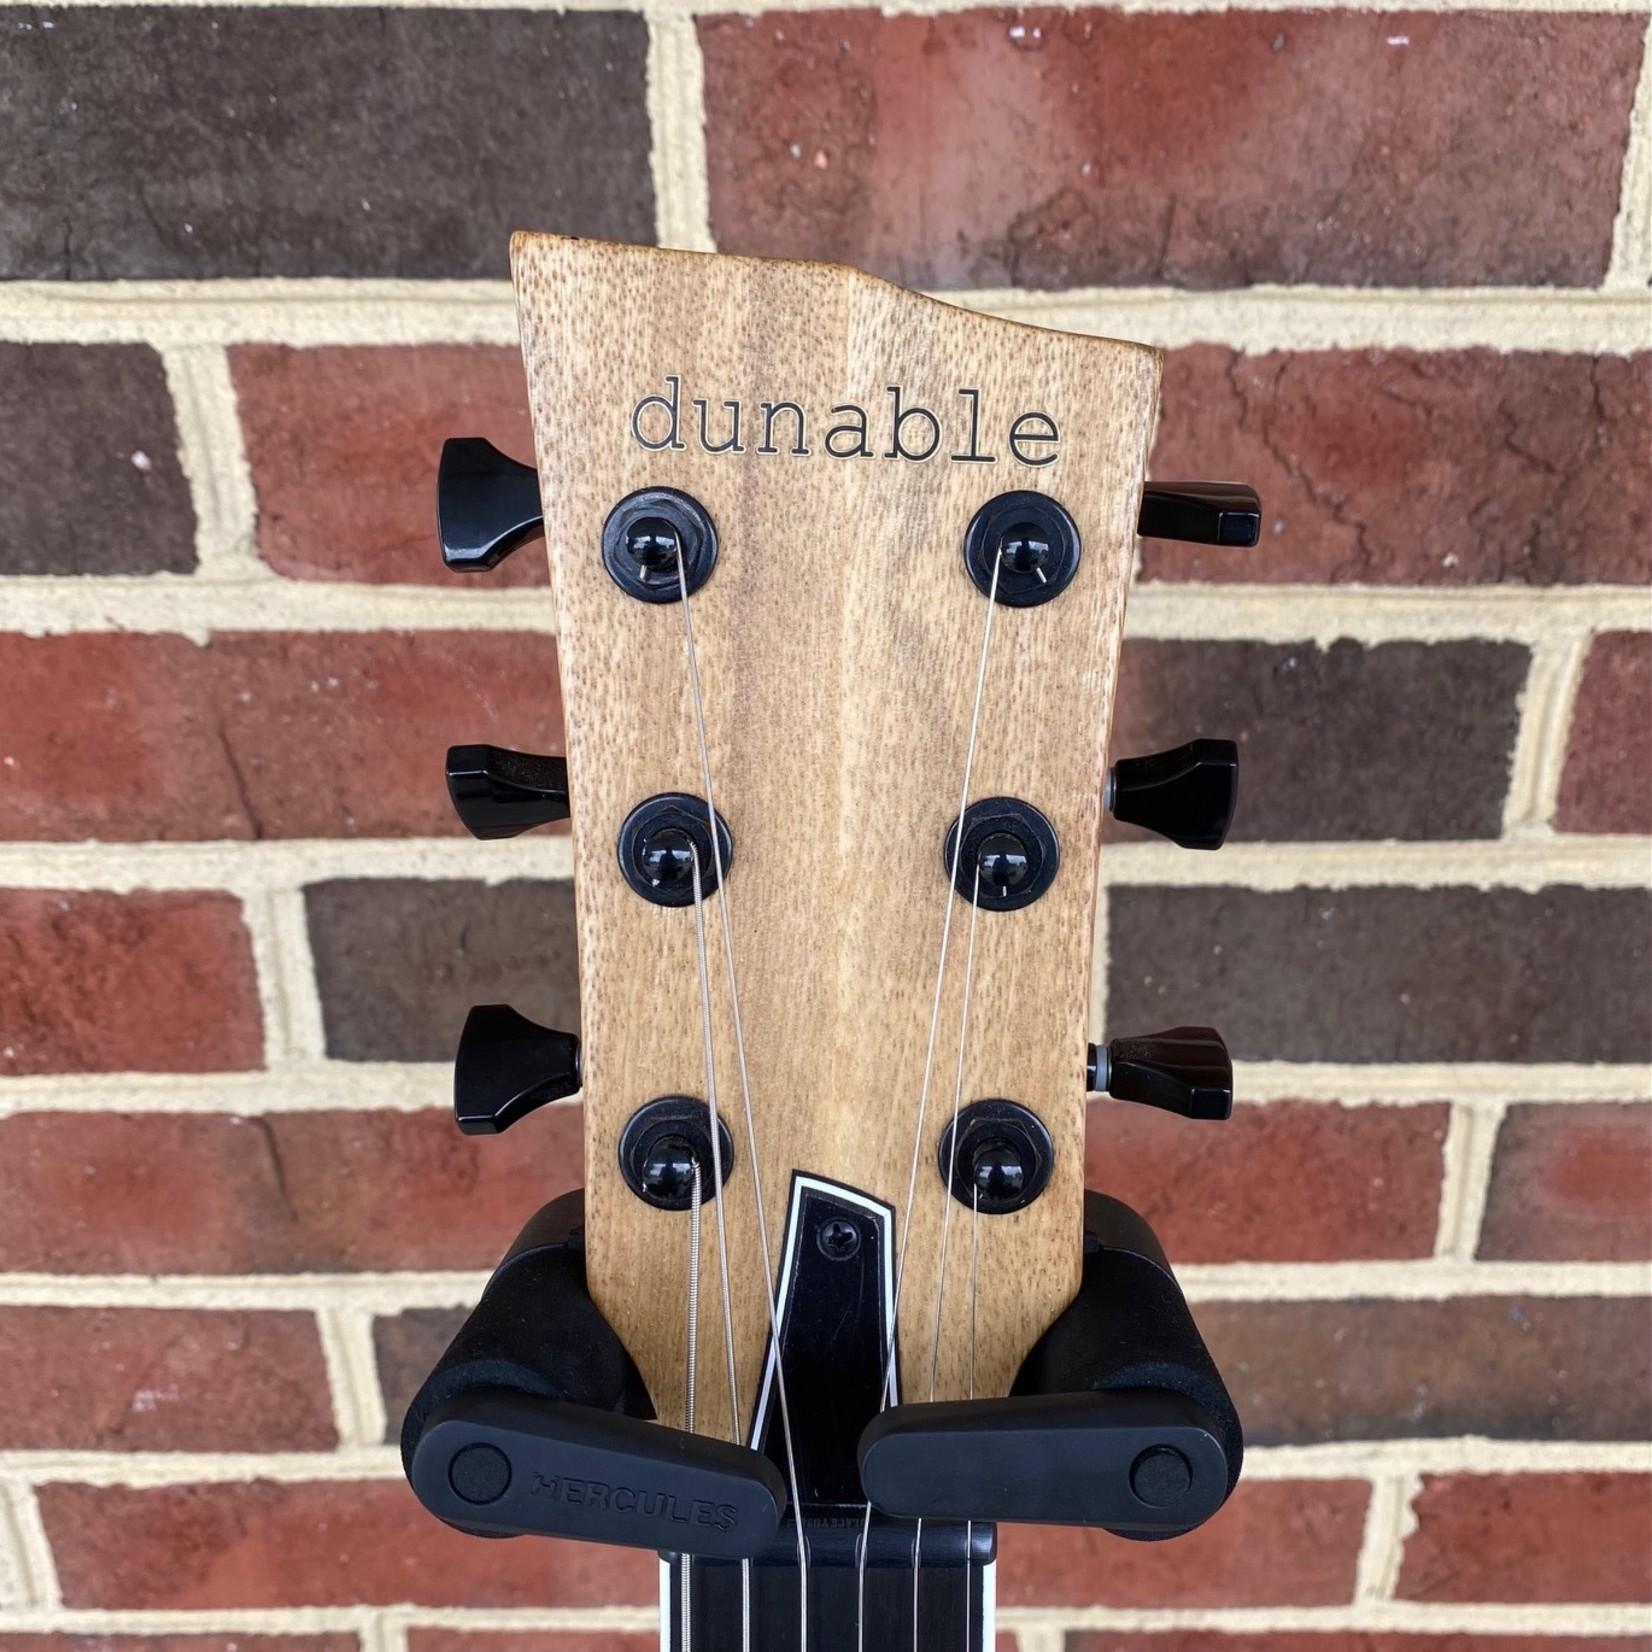 Dunable Guitars Dunable Guitars USA Custom Shop Asteroid, Black Limba Body, No Pickguard, Direwolf Pickups, Locking Tuners, SN# 21206